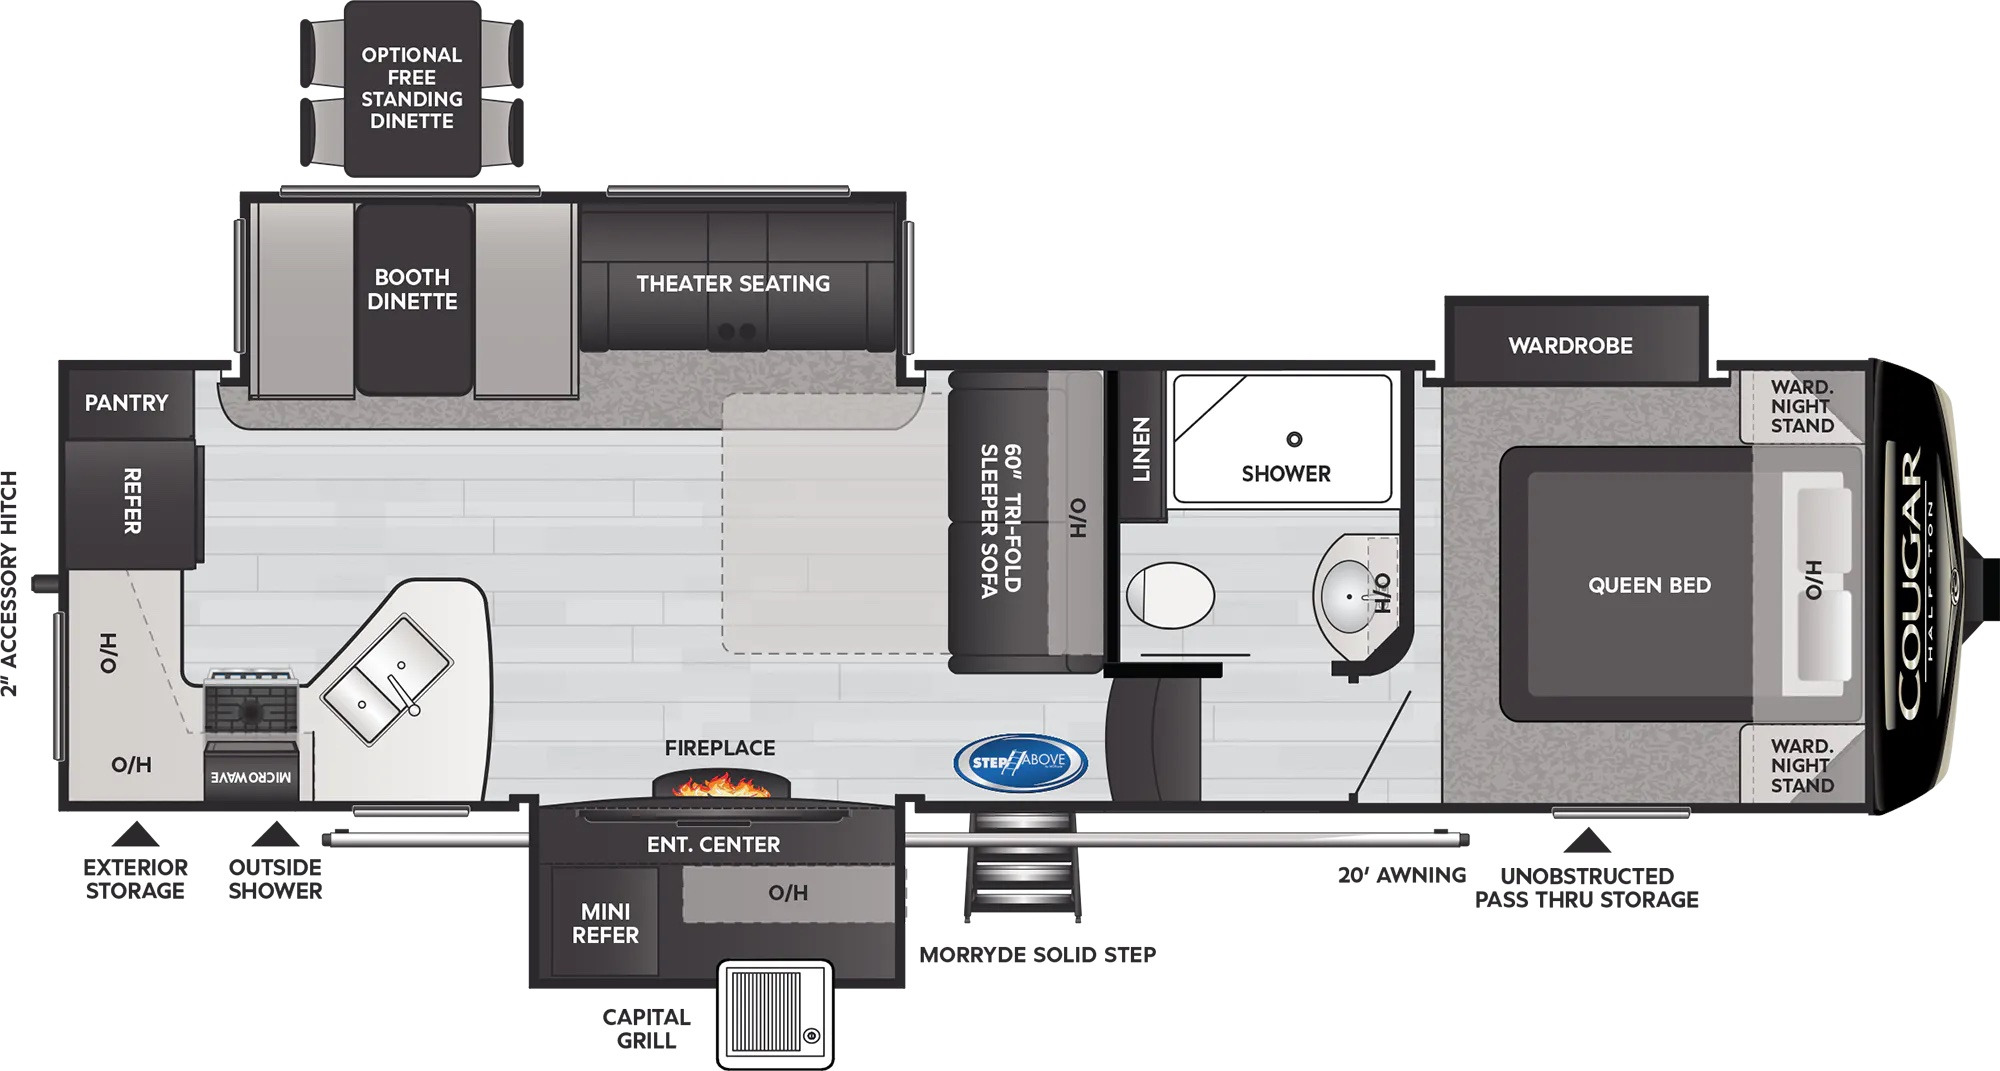 View Floor Plan for 2022 KEYSTONE COUGAR 29RKS